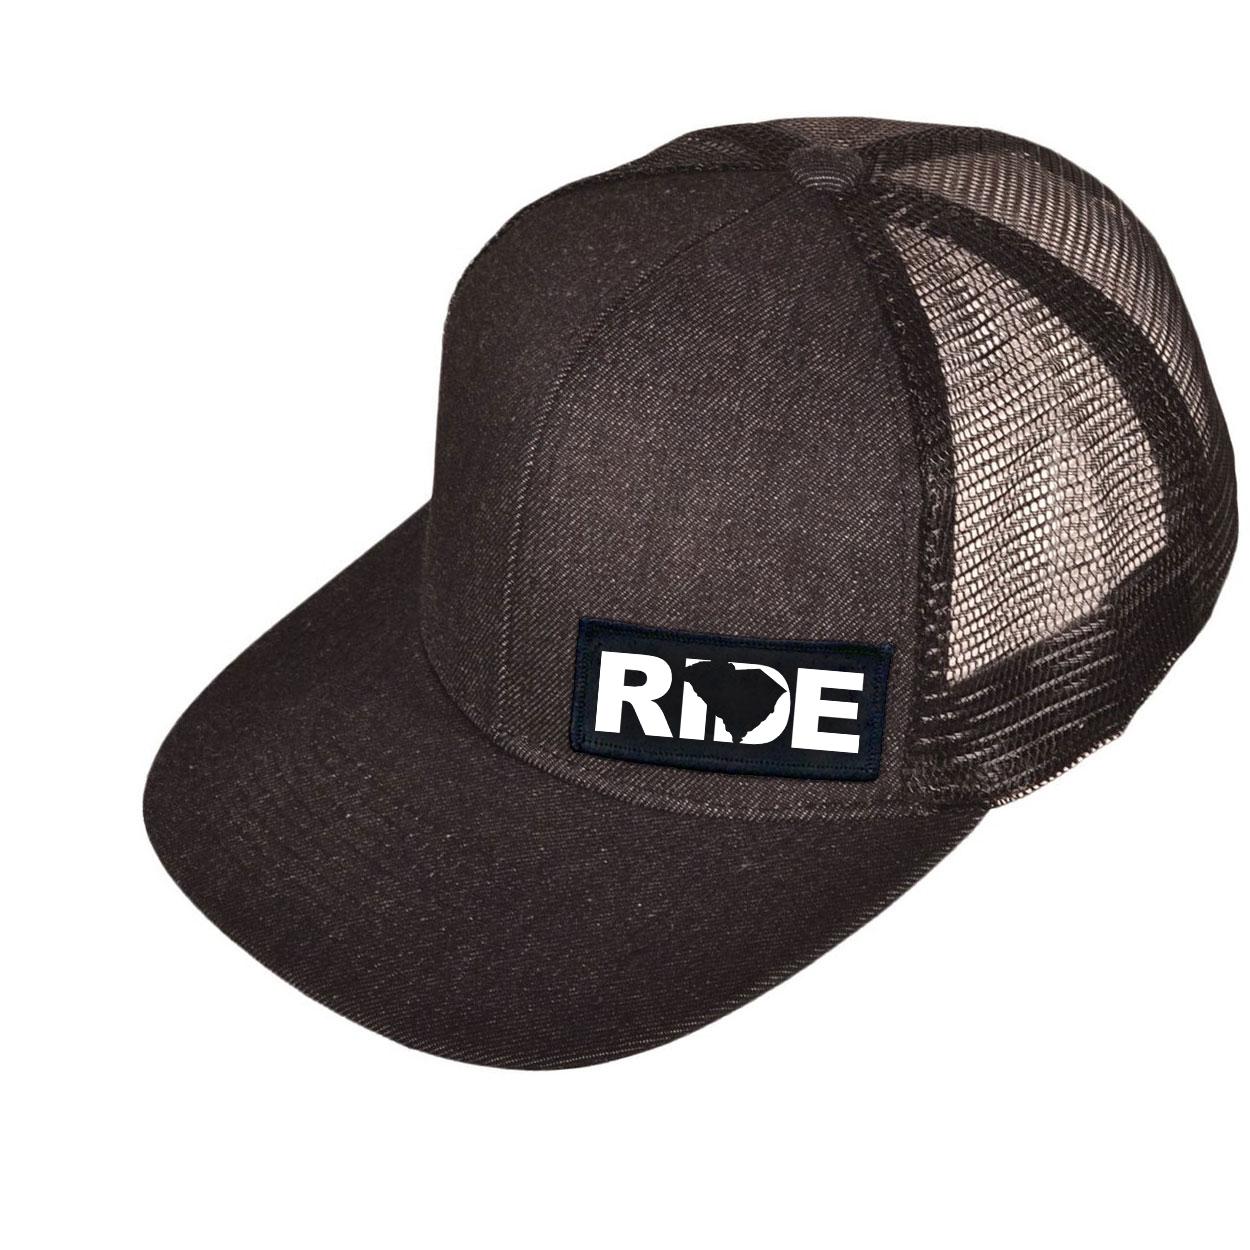 Ride South Carolina Night Out Woven Patch Snapback Flat Brim Hat Black Denim (White Logo)